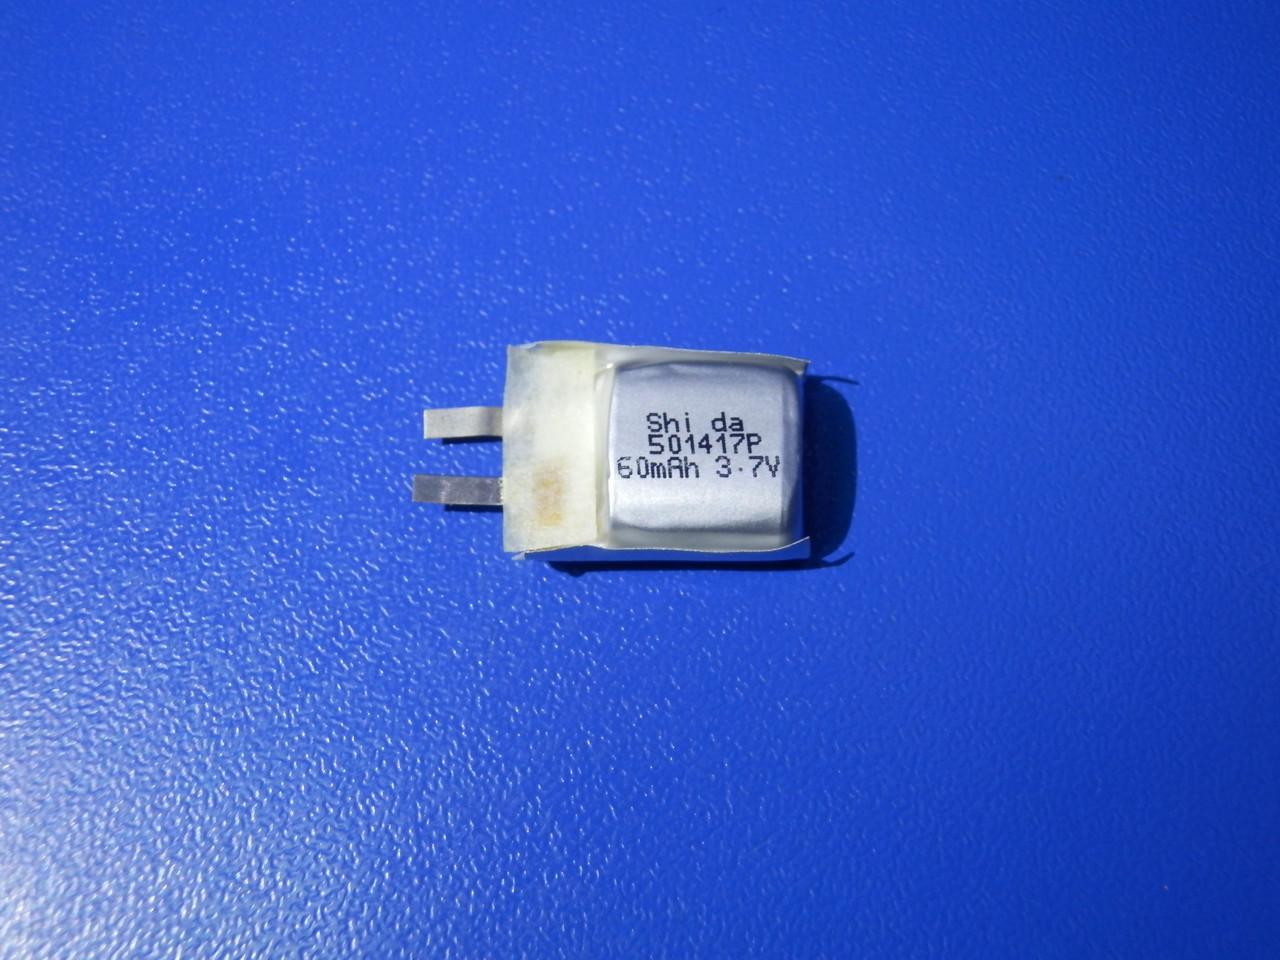 Аккумулятор Li-pol Shida 501417P 3,7v 60mAh